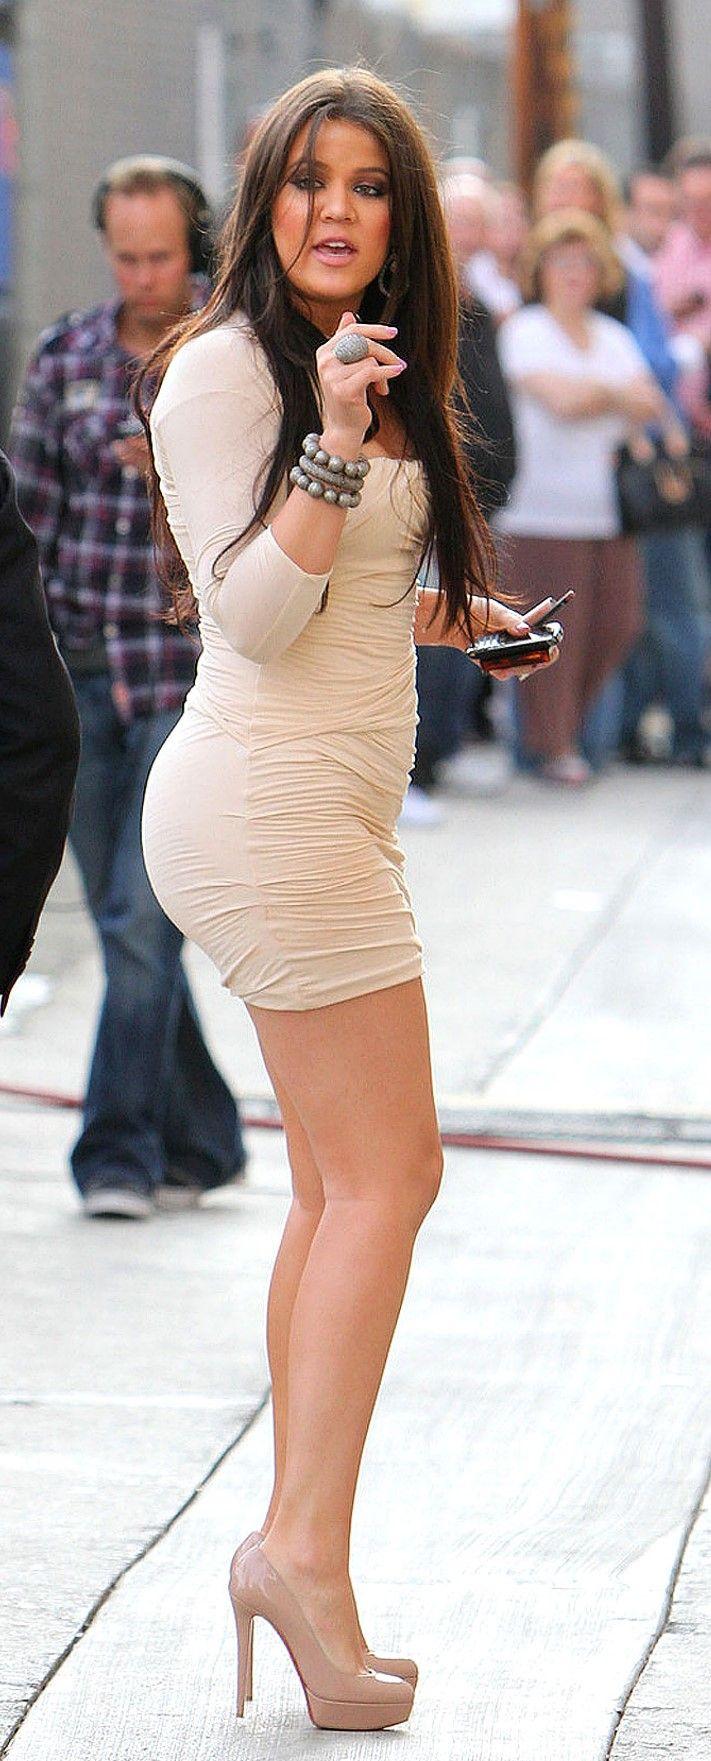 Fappening Khloe Kardashian naked (51 photos), Pussy, Sideboobs, Feet, underwear 2020